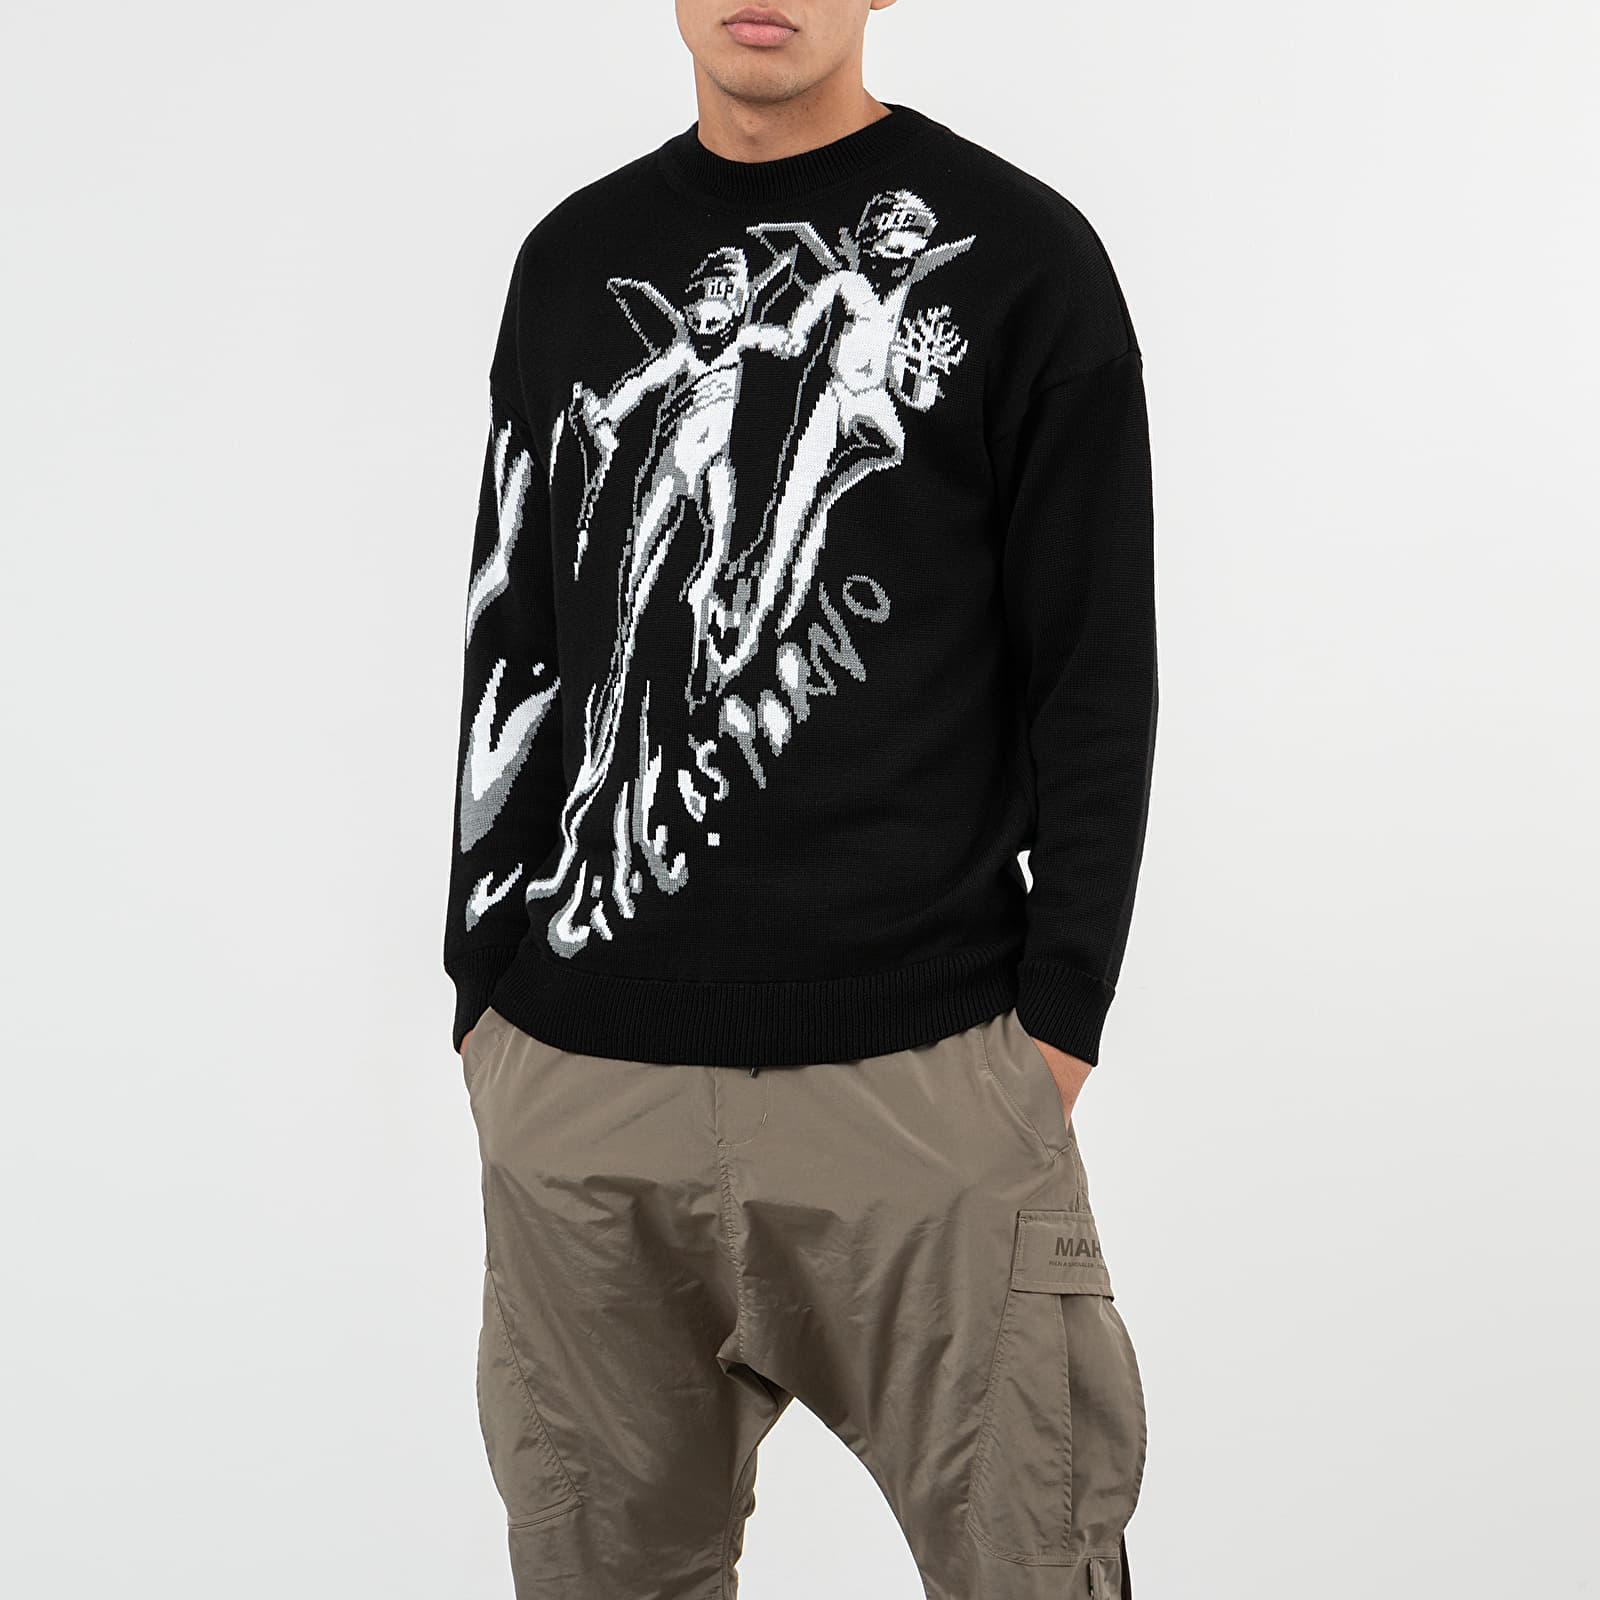 Mikiny a svetry LIFE IS PORNO xxx Footshop Sweater Black